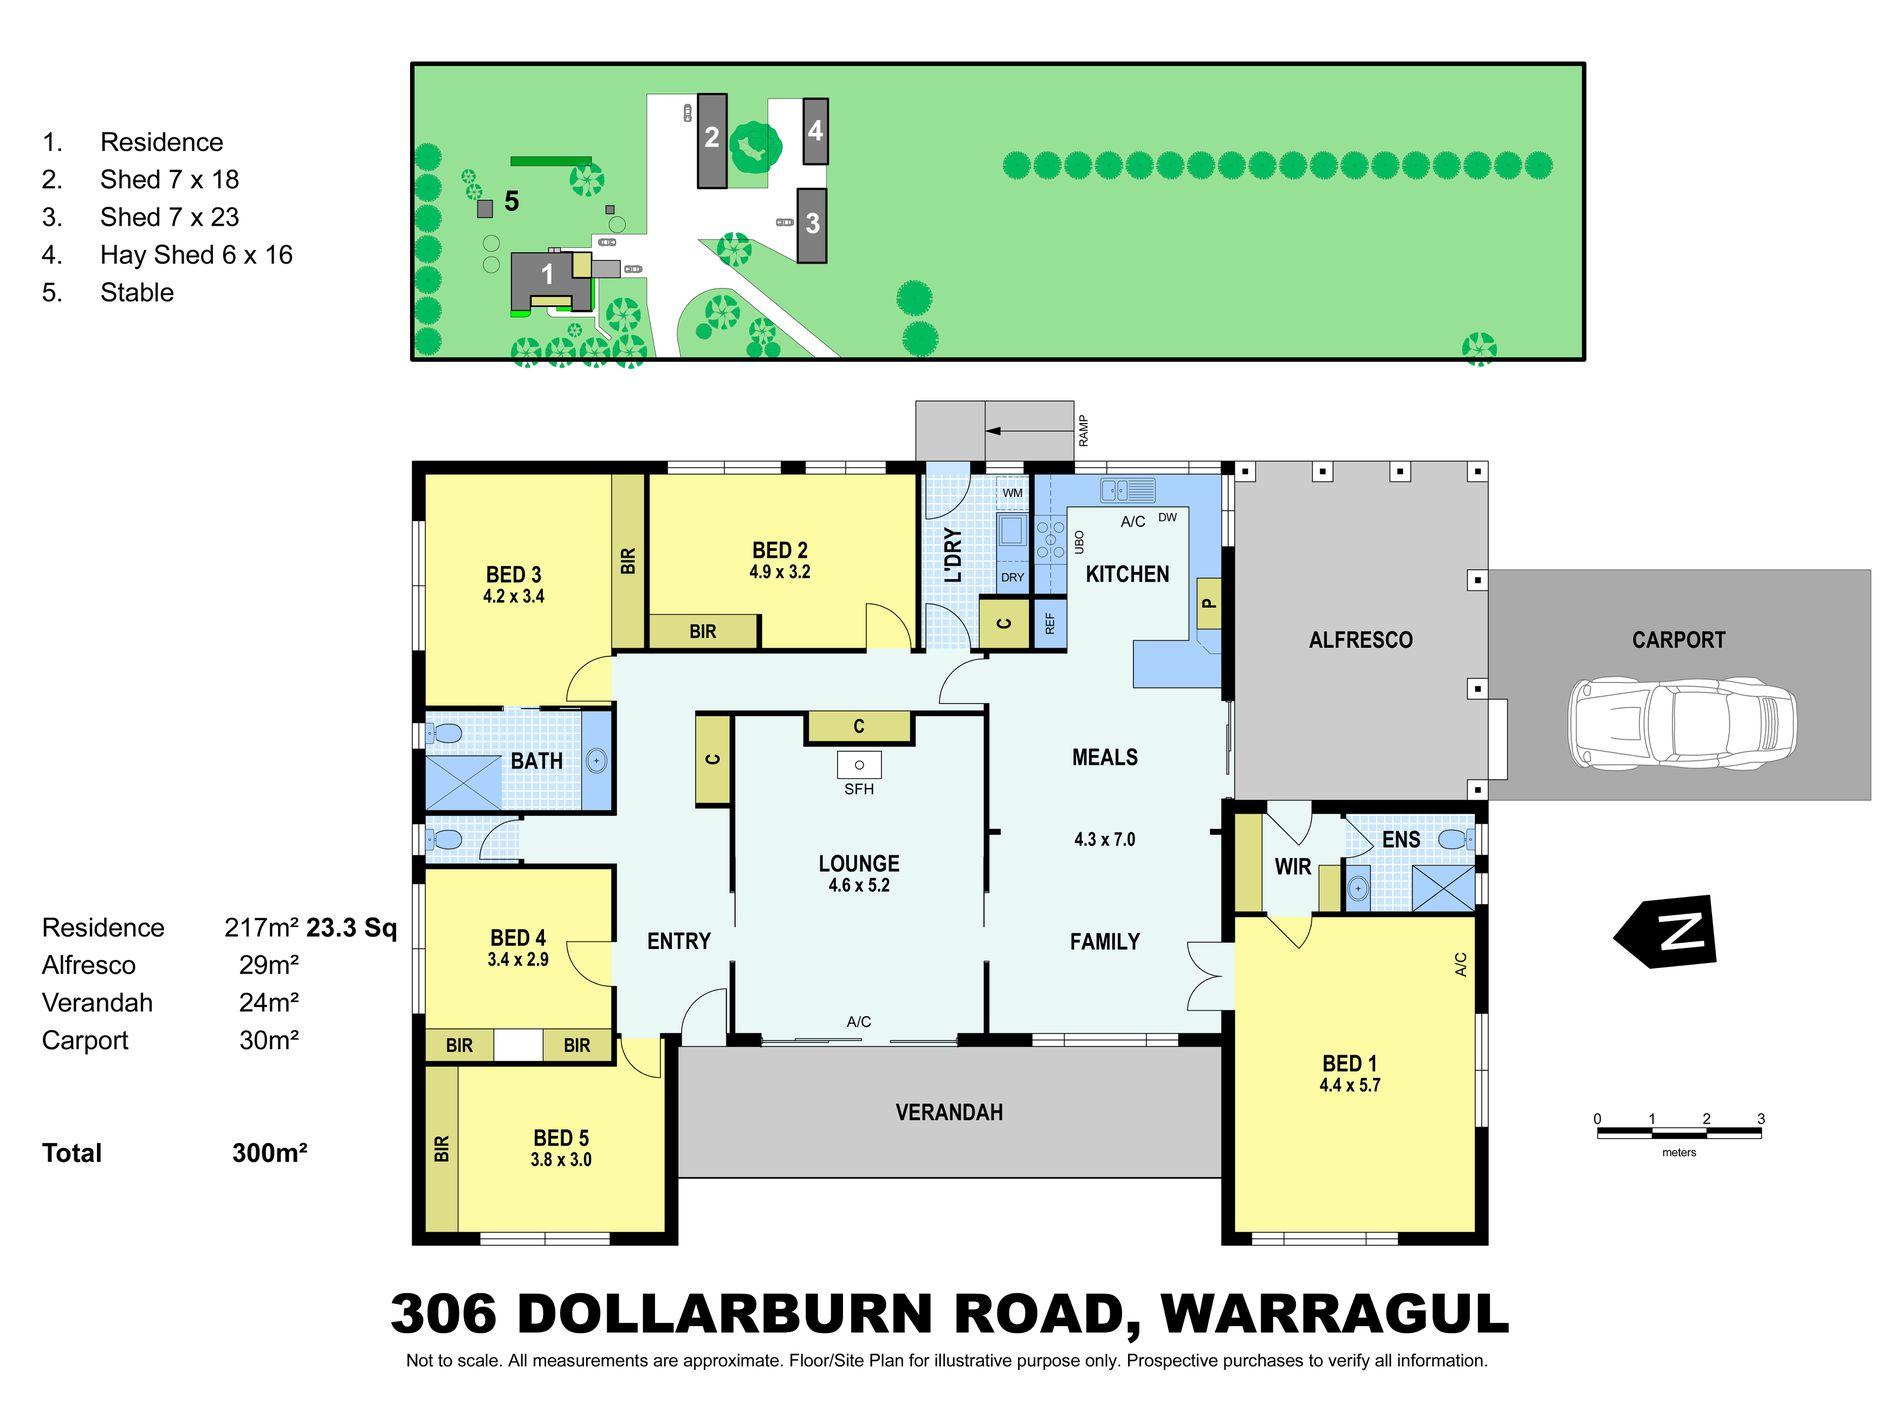 306 Dollarburn Road, Warragul